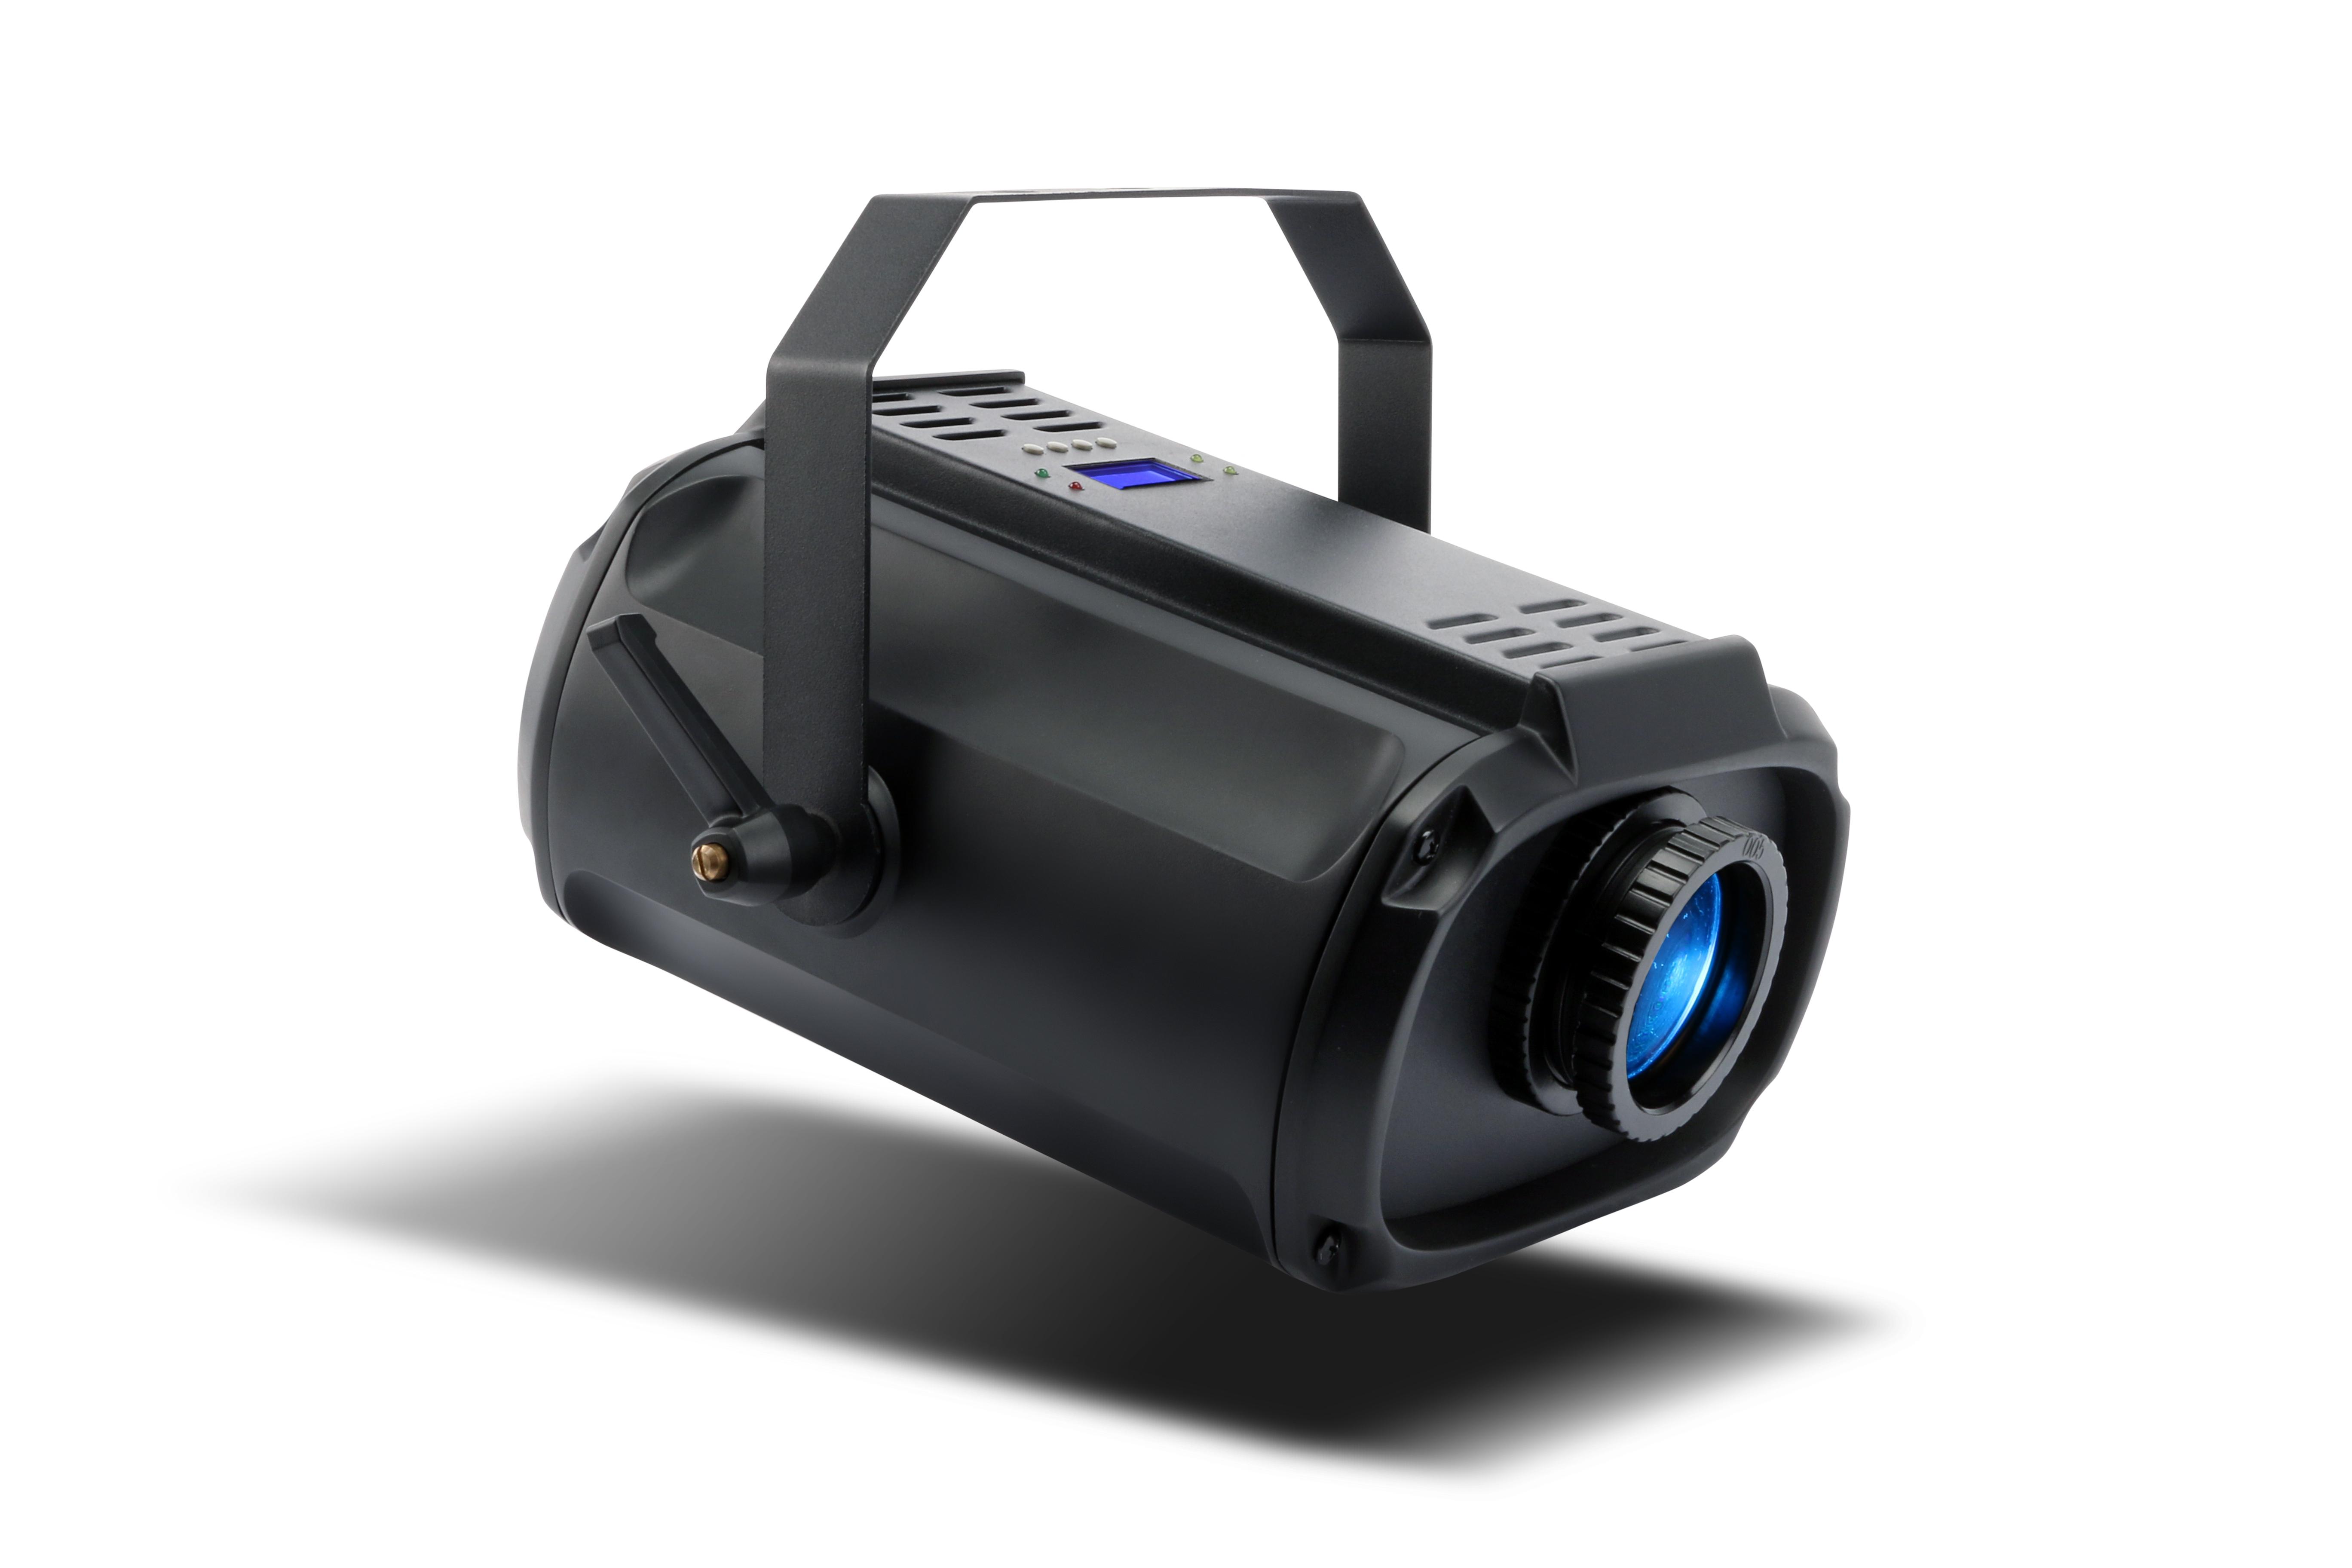 Harman's Martin Professional Introduces RUSH DC 1 Aqua LED Fixture